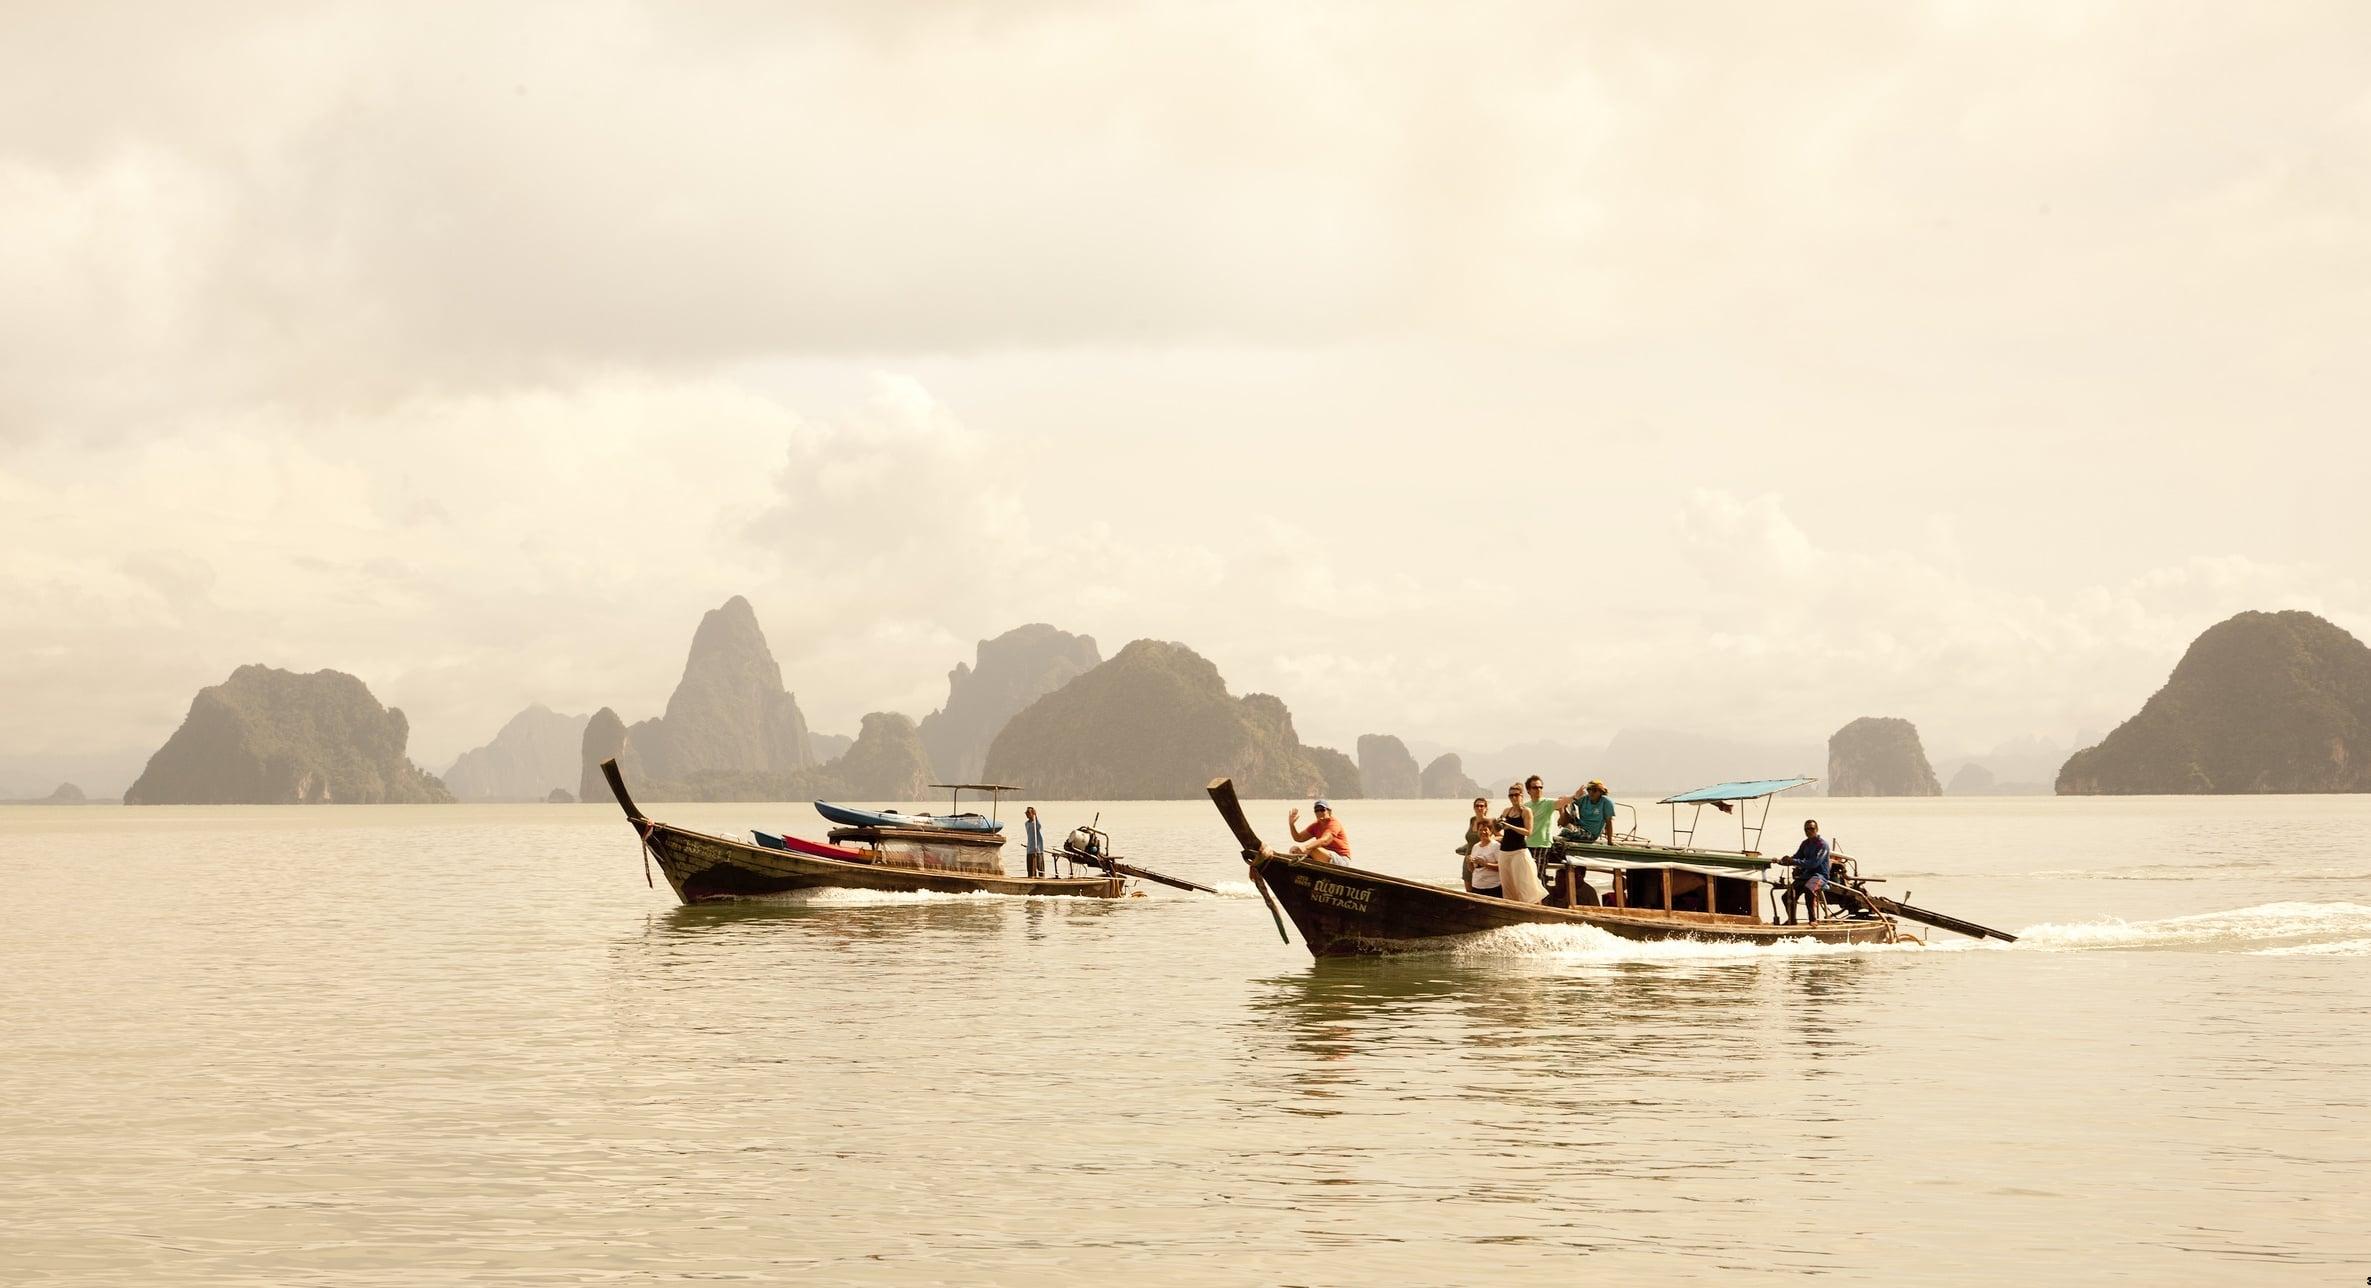 Wakacje all inclusive w Tajlandii